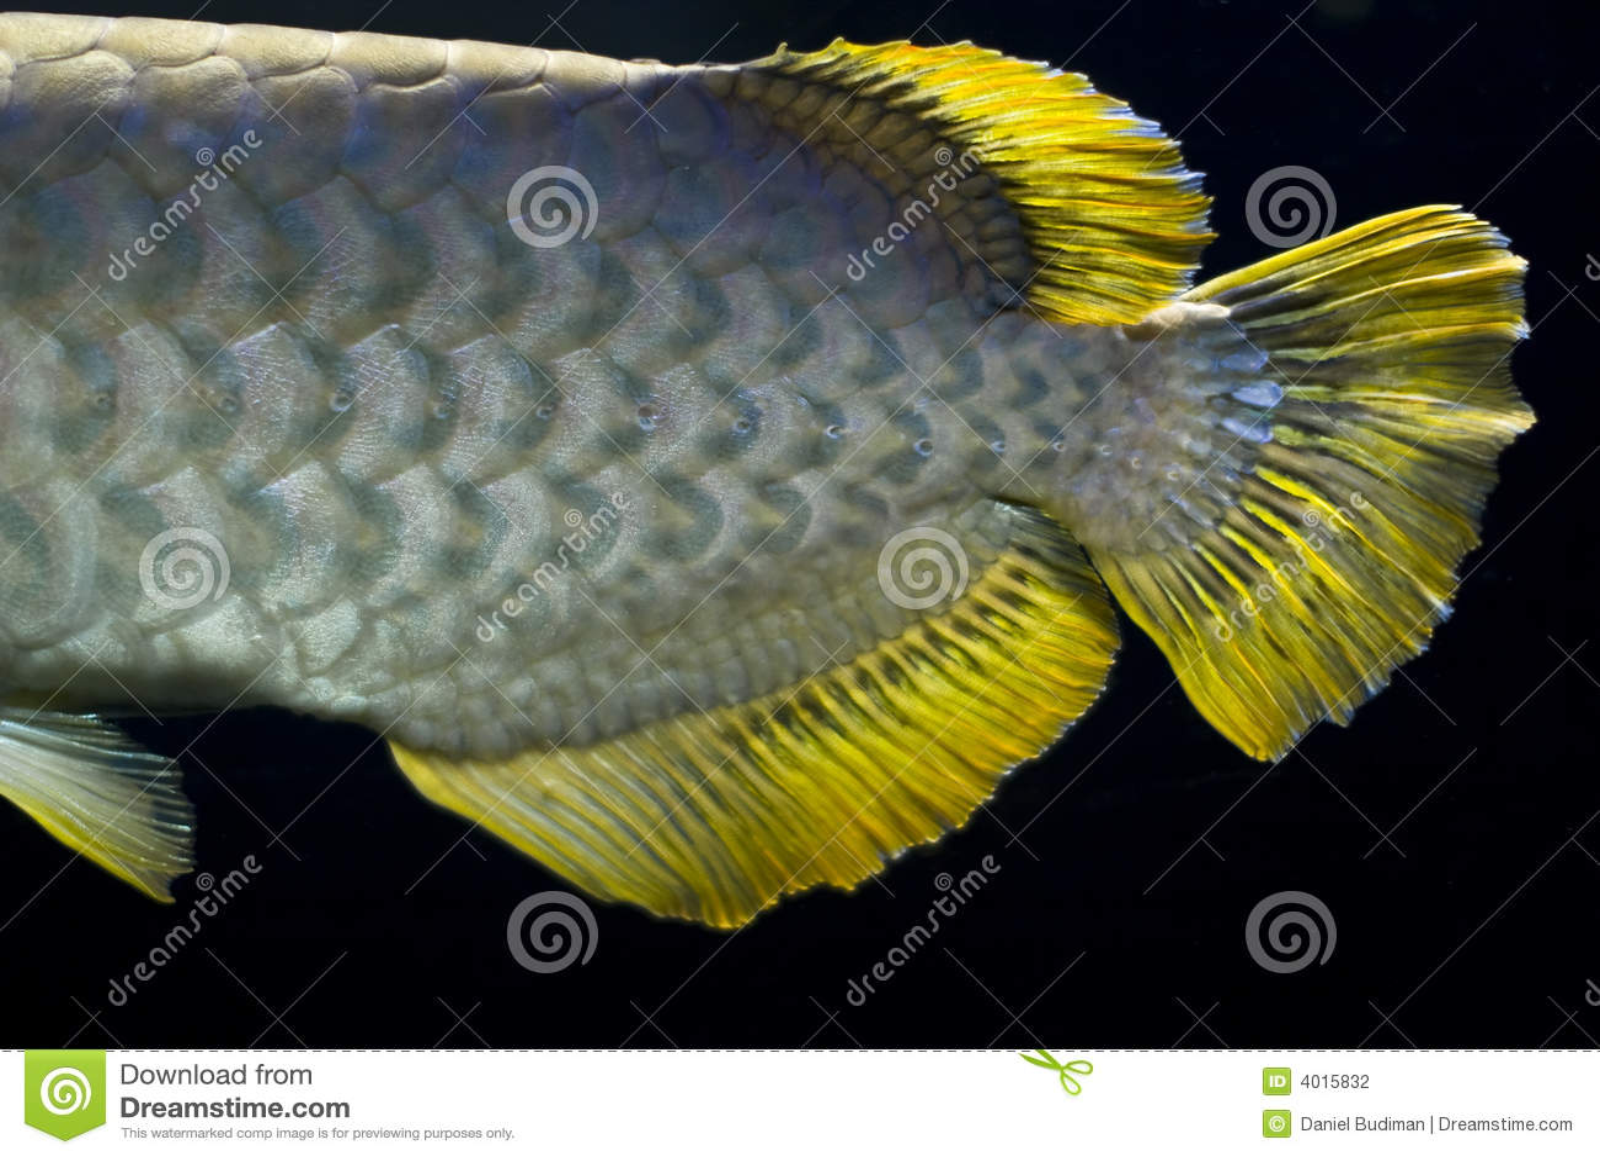 Golden arowana tail close up stock photography image for Arowana fish tank decoration